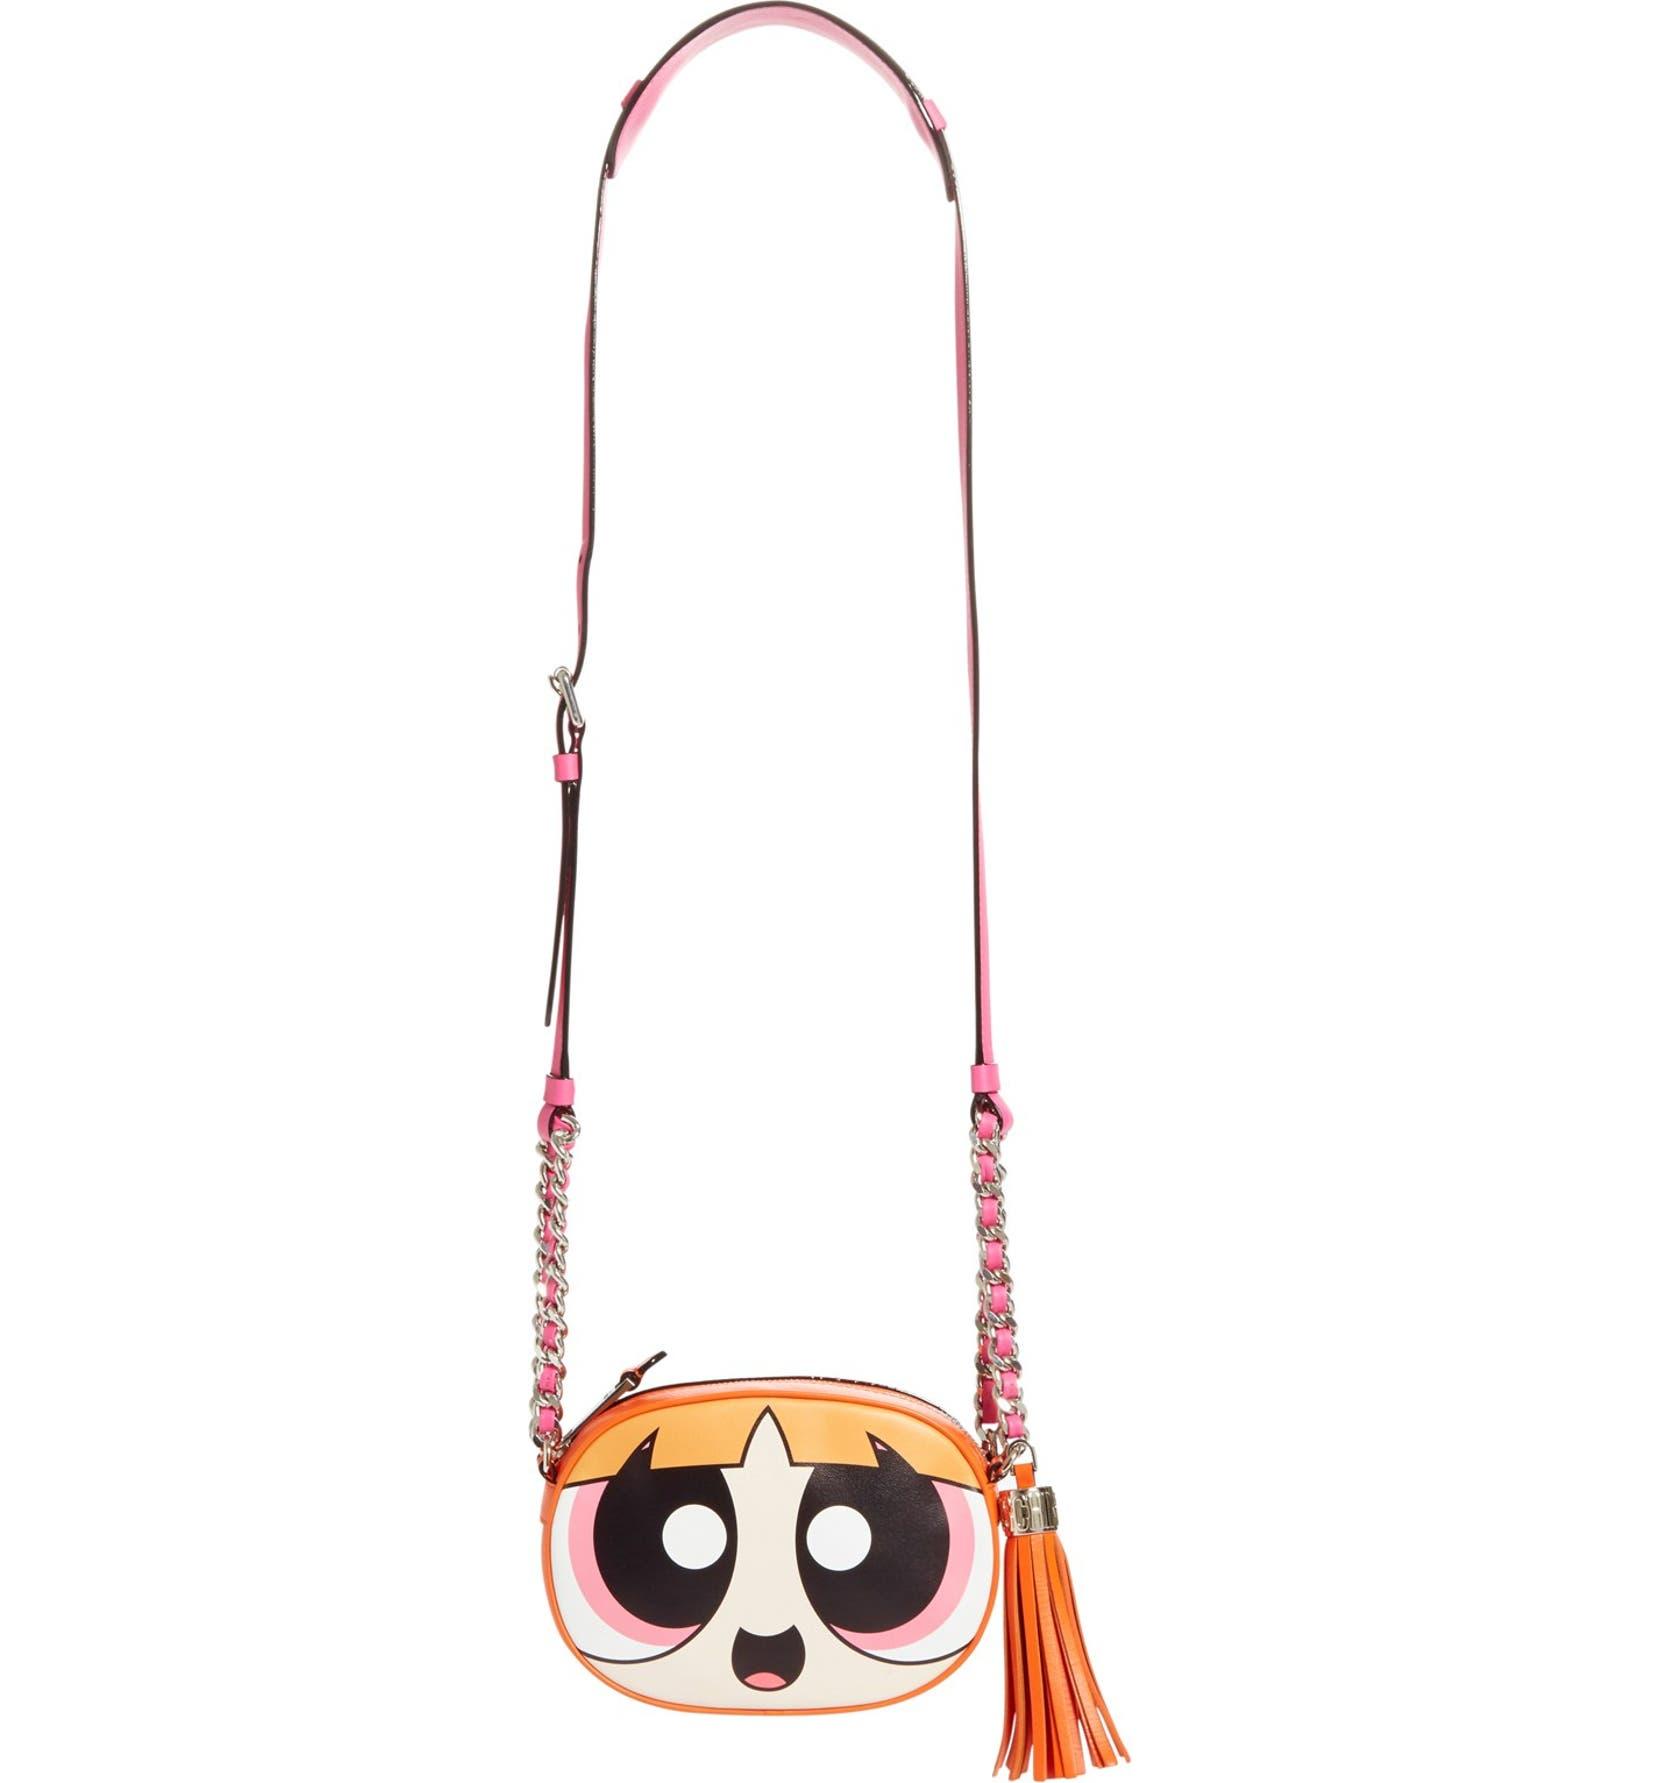 dbfe0854067bb Moschino 'The Powerpuff Girls® - Blossom' Canteen Crossbody Bag | Nordstrom